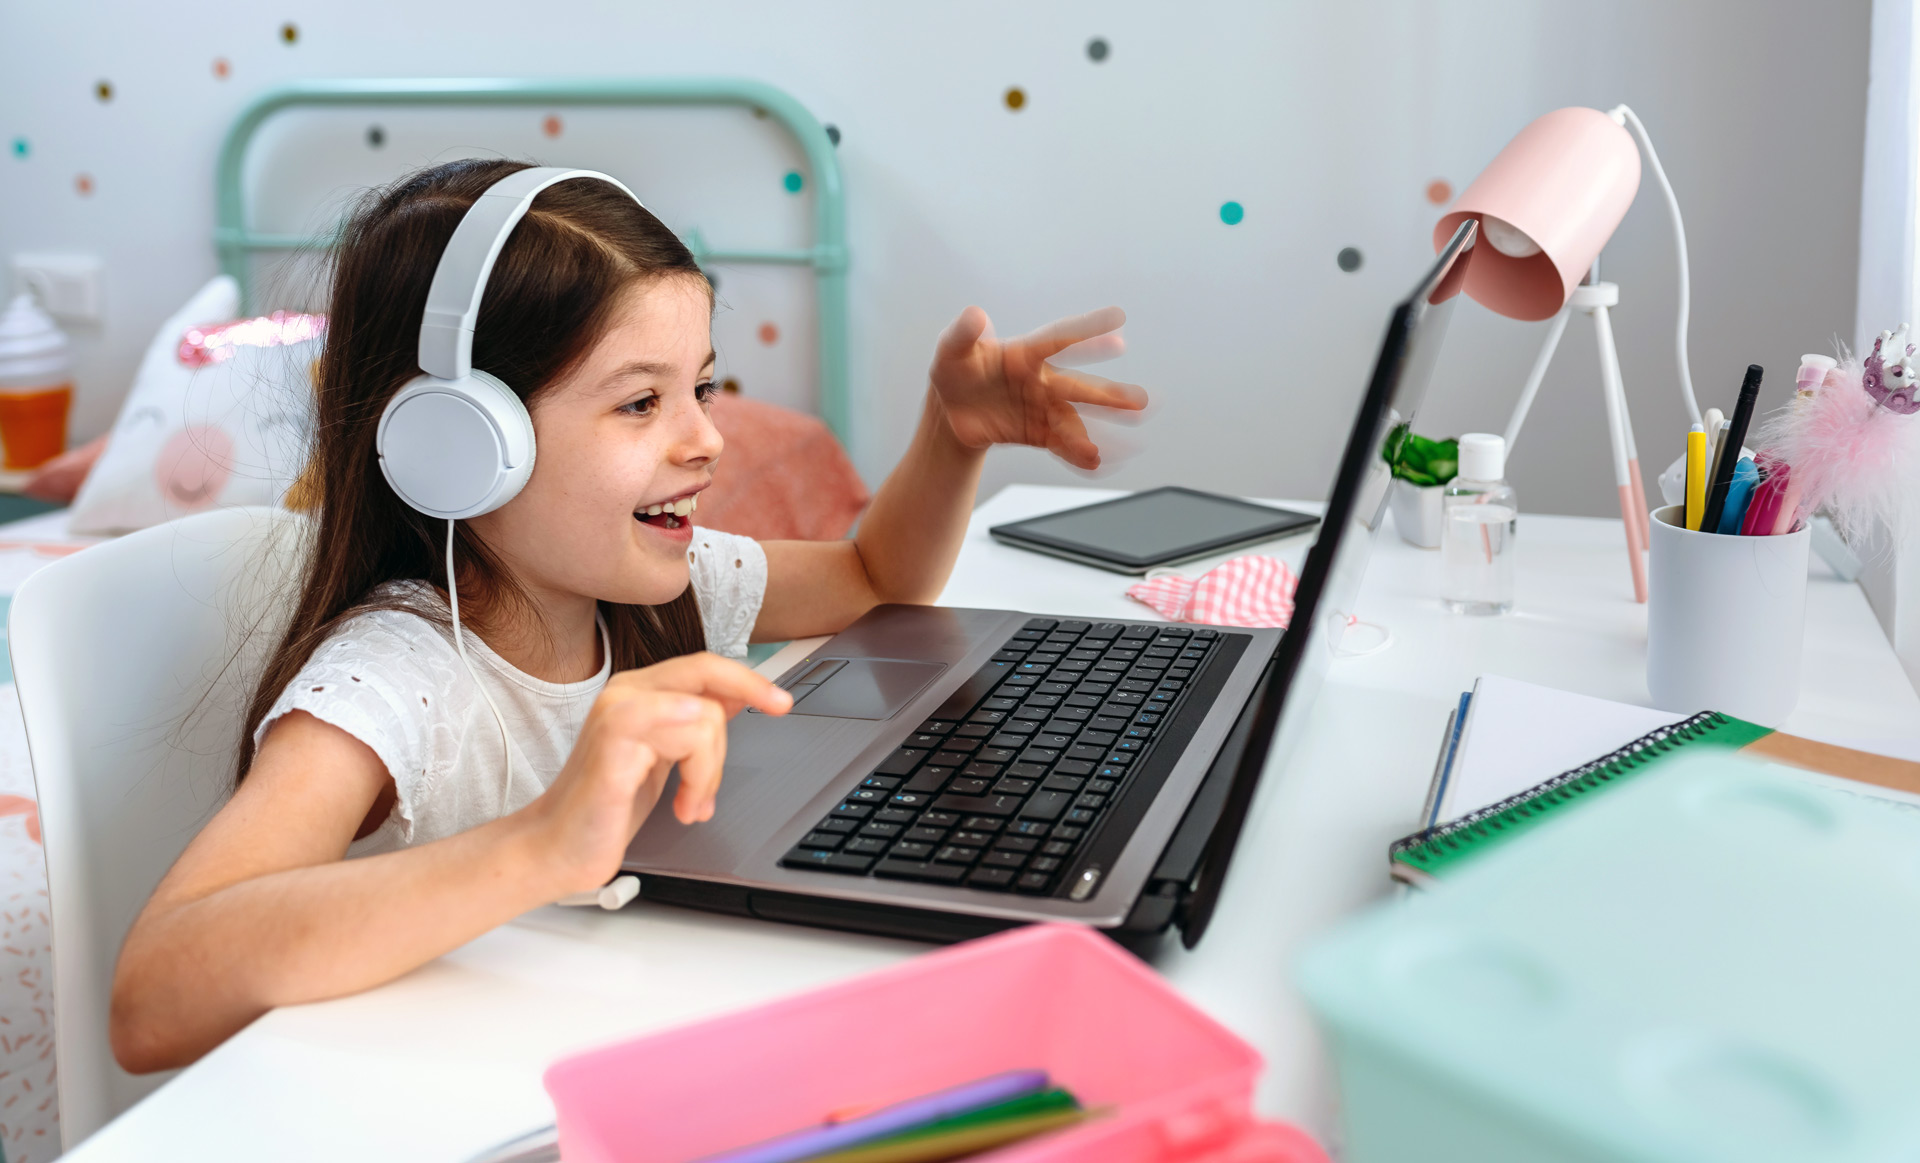 Enseñanza de español a niños en línea 15 h.